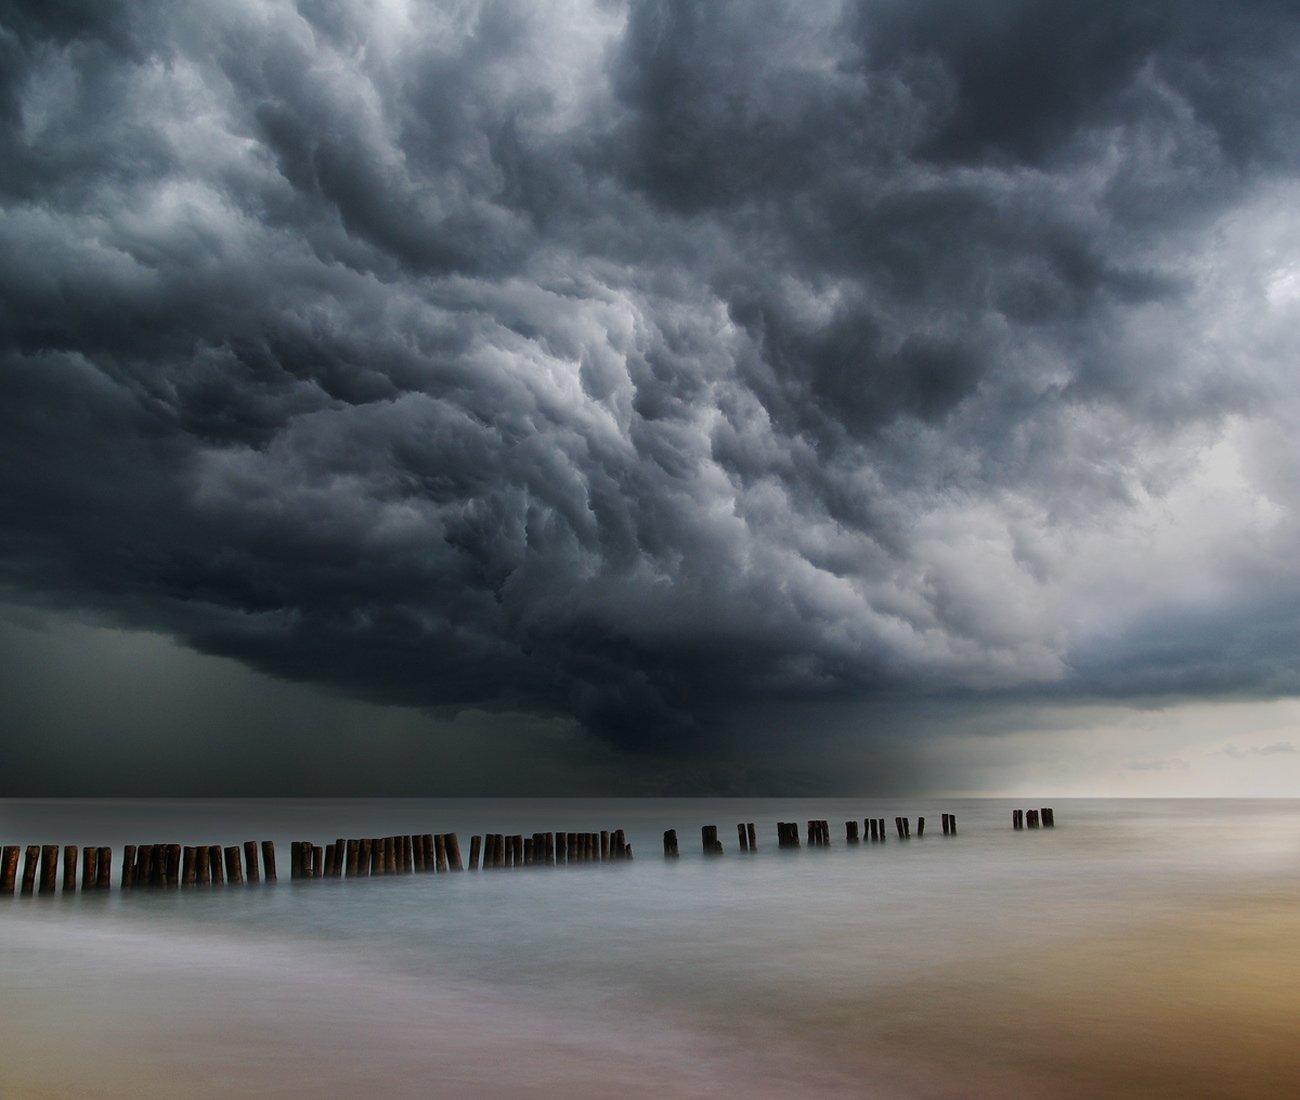 storm, clouds, Linhuania, sea, Mindaugas Žarys